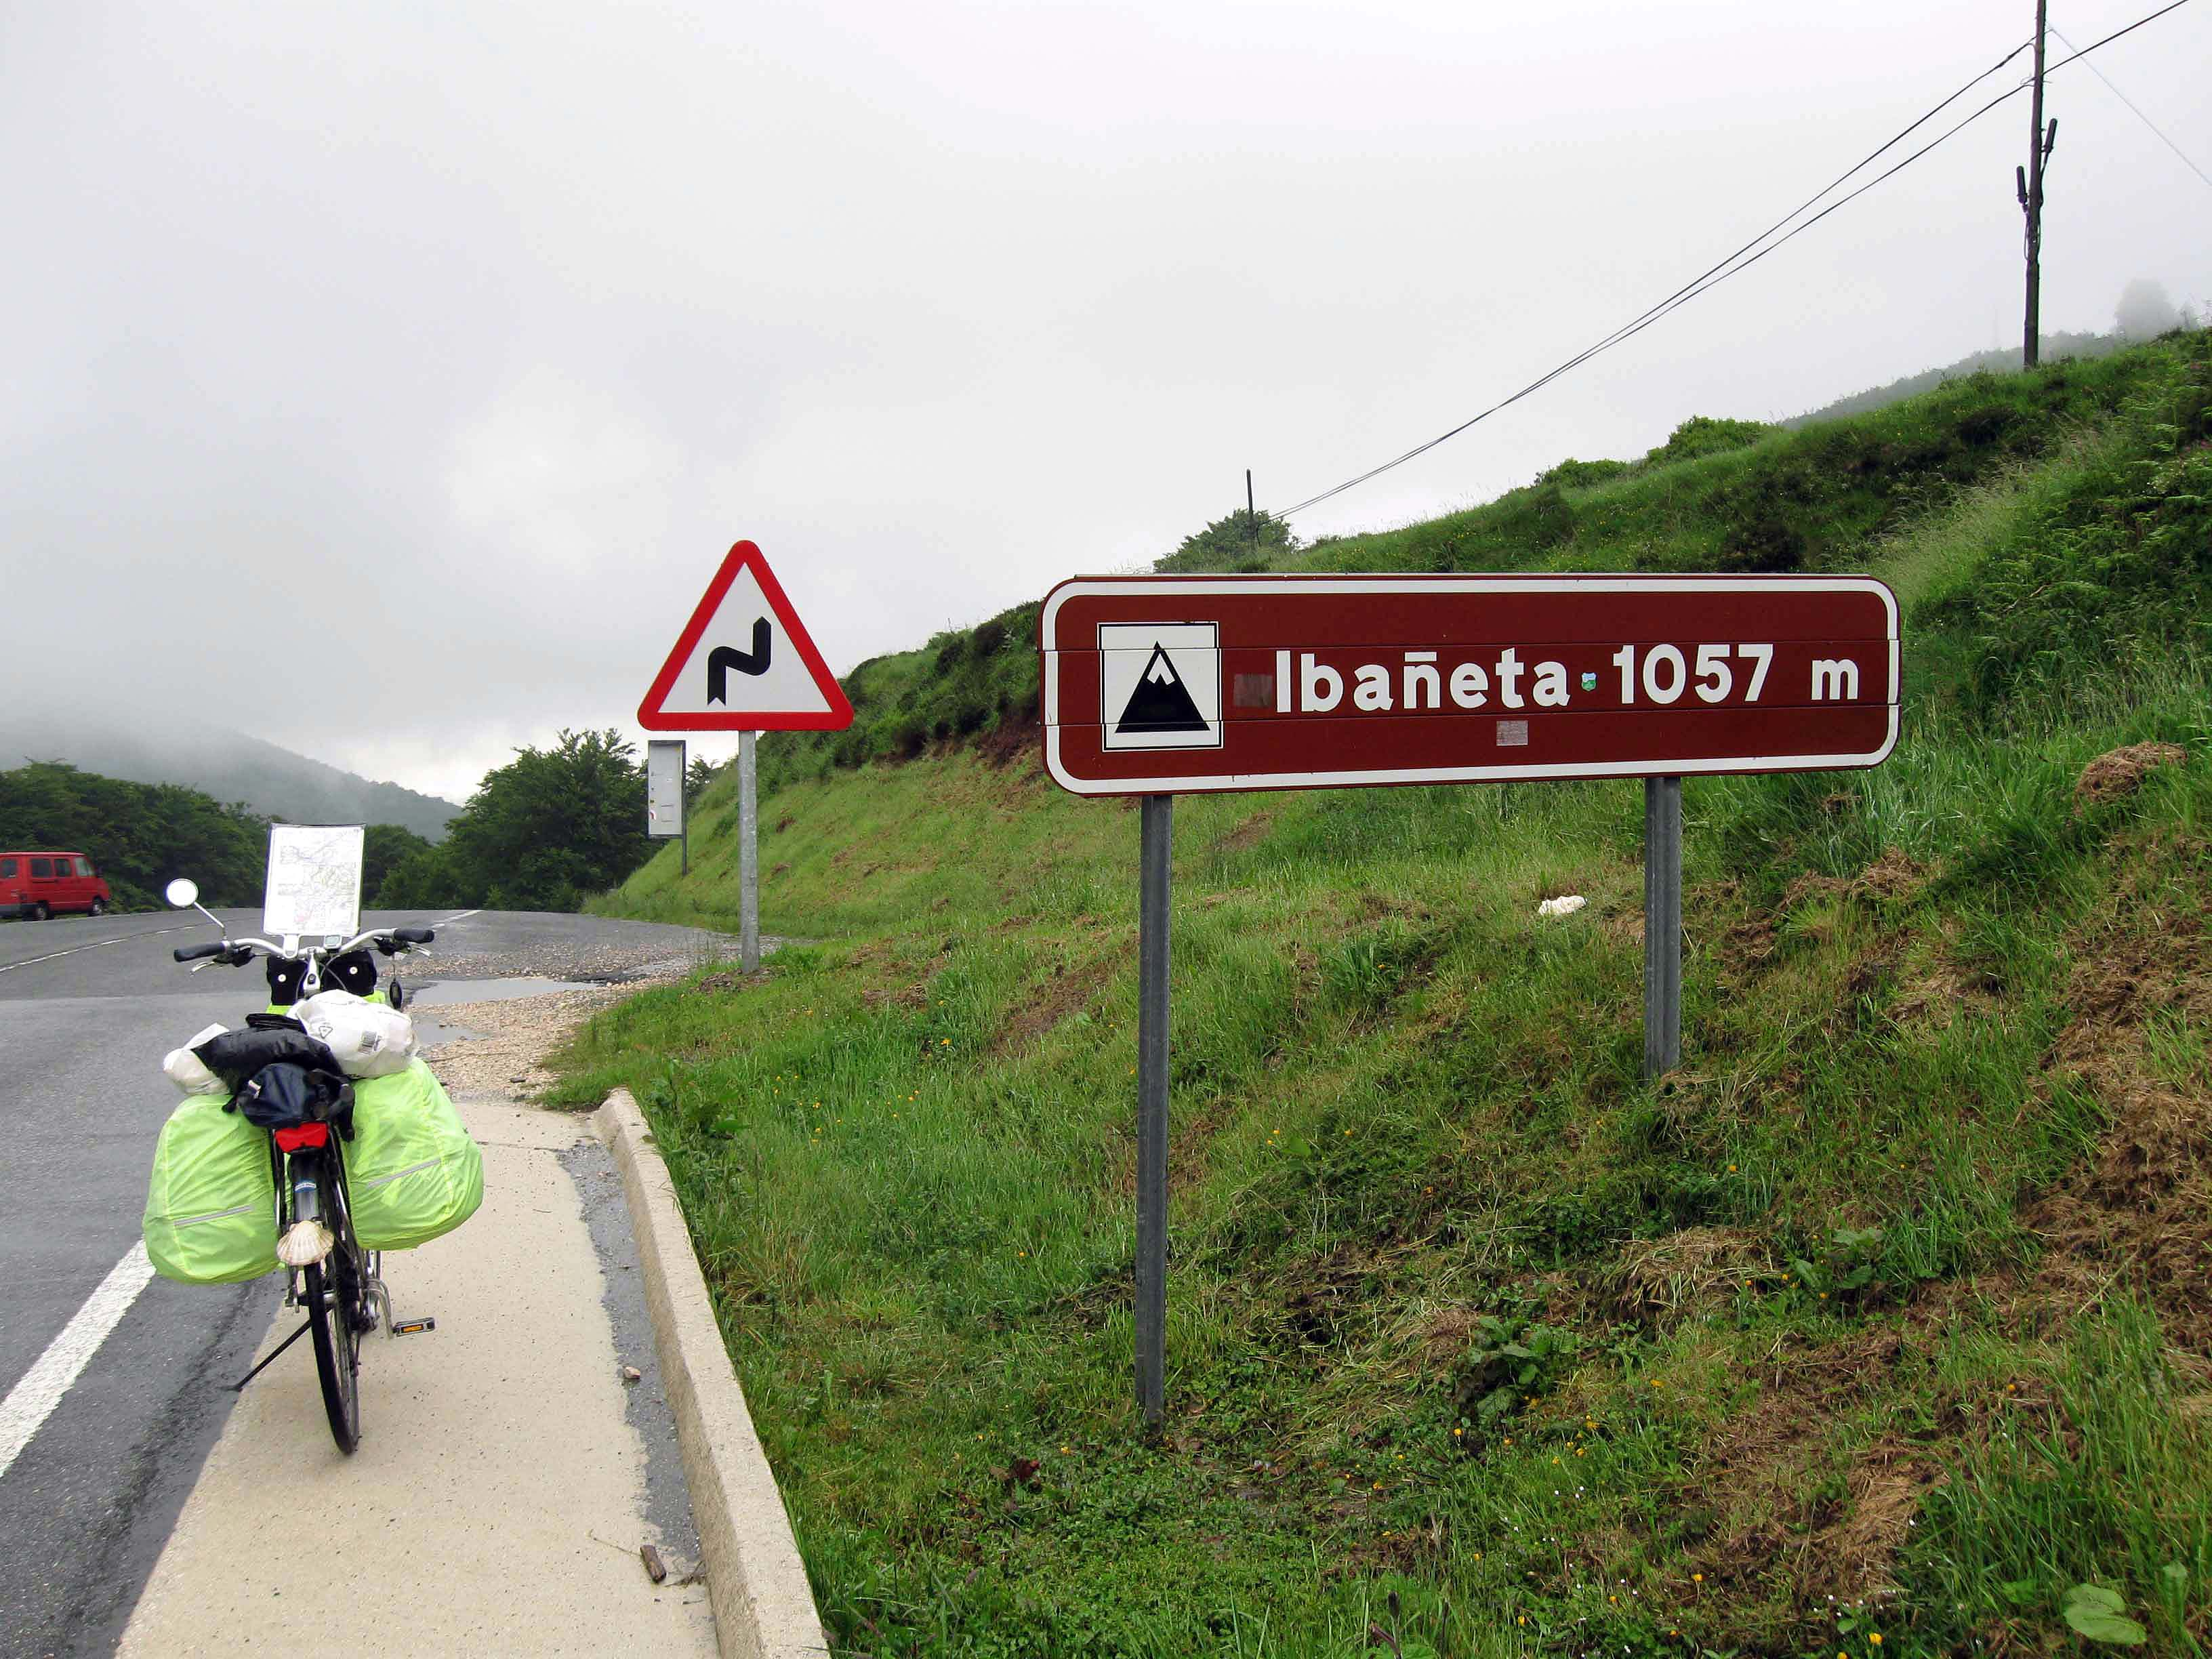 De pelgrimstocht naar santiago per fiets – pagina 3